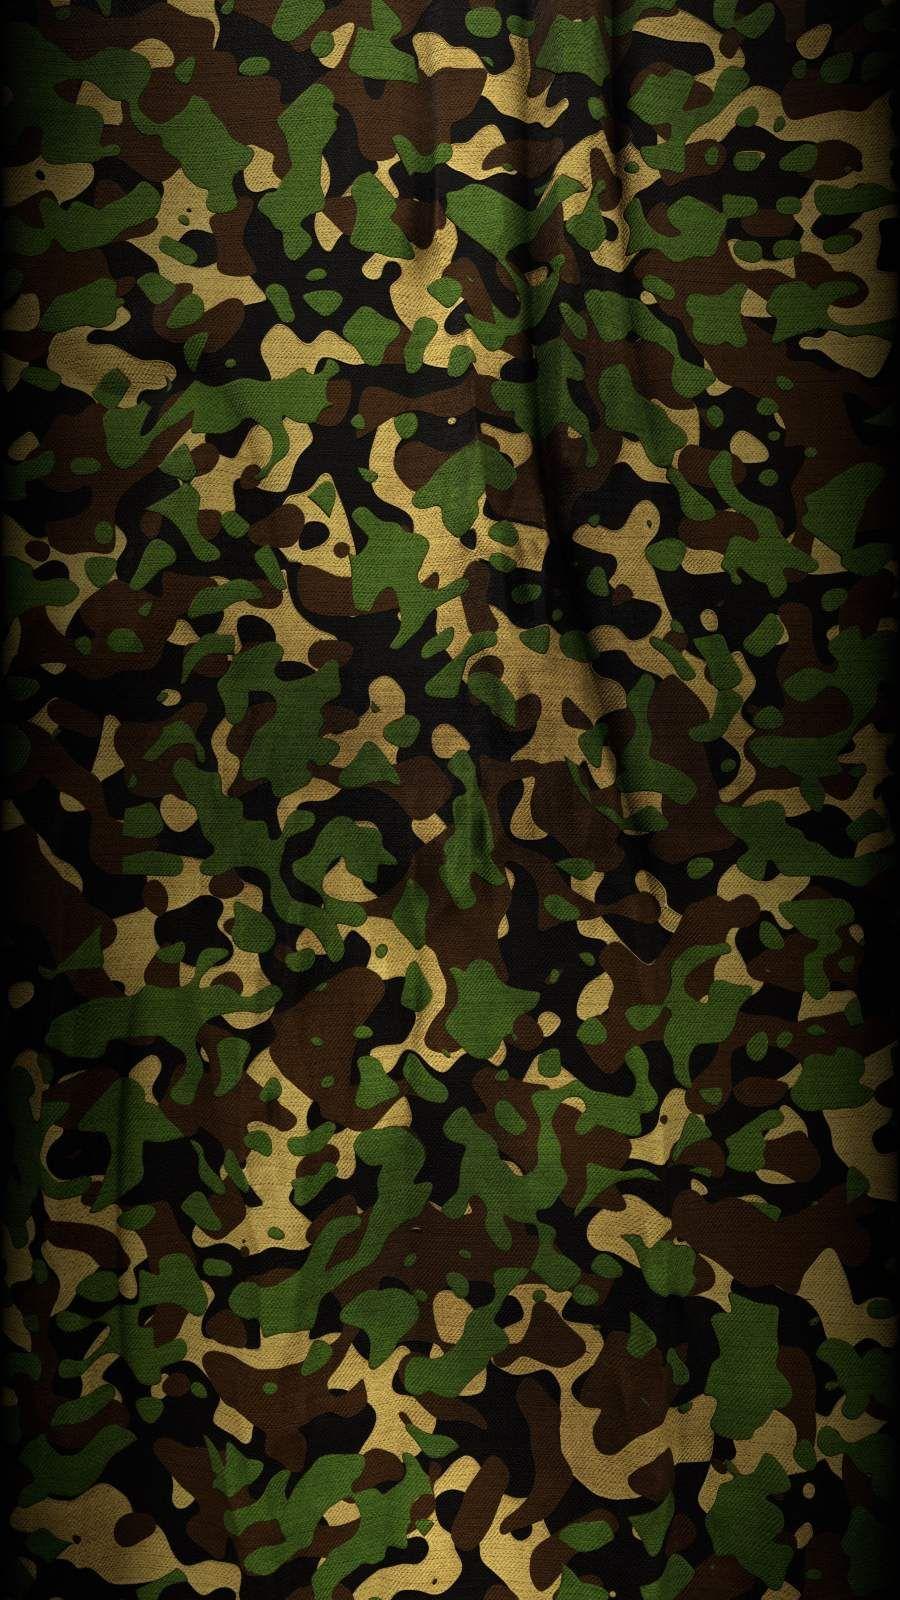 Army Wallpapers Iphone Wallpapers Iphone Wallpapers Camouflage Wallpaper Camo Wallpaper Iphone Wallpaper